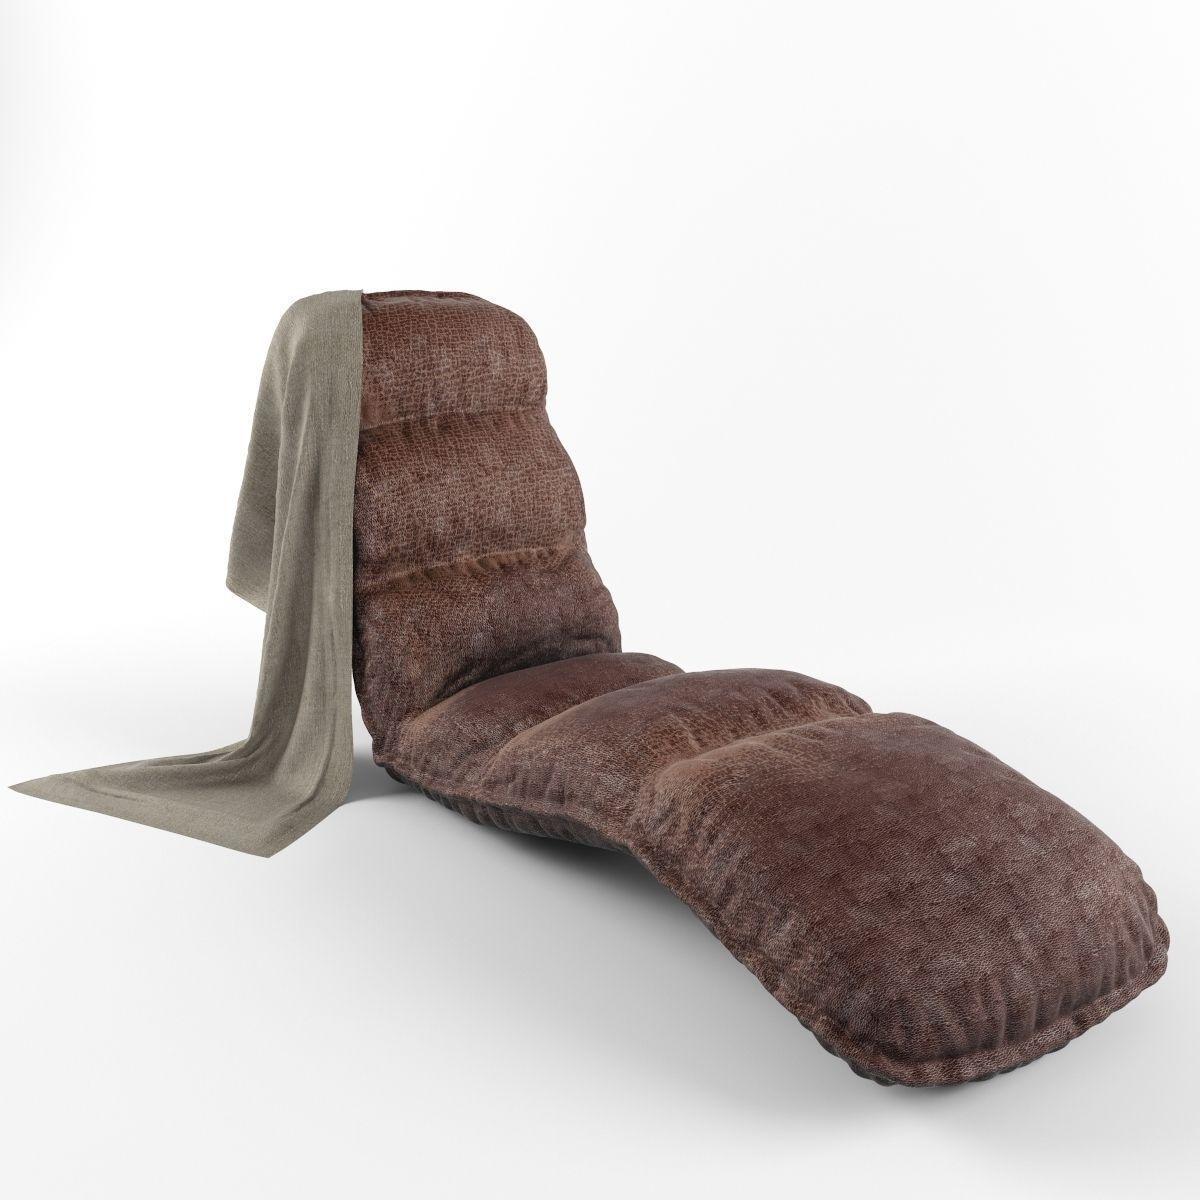 Adjustable Lounge Chair